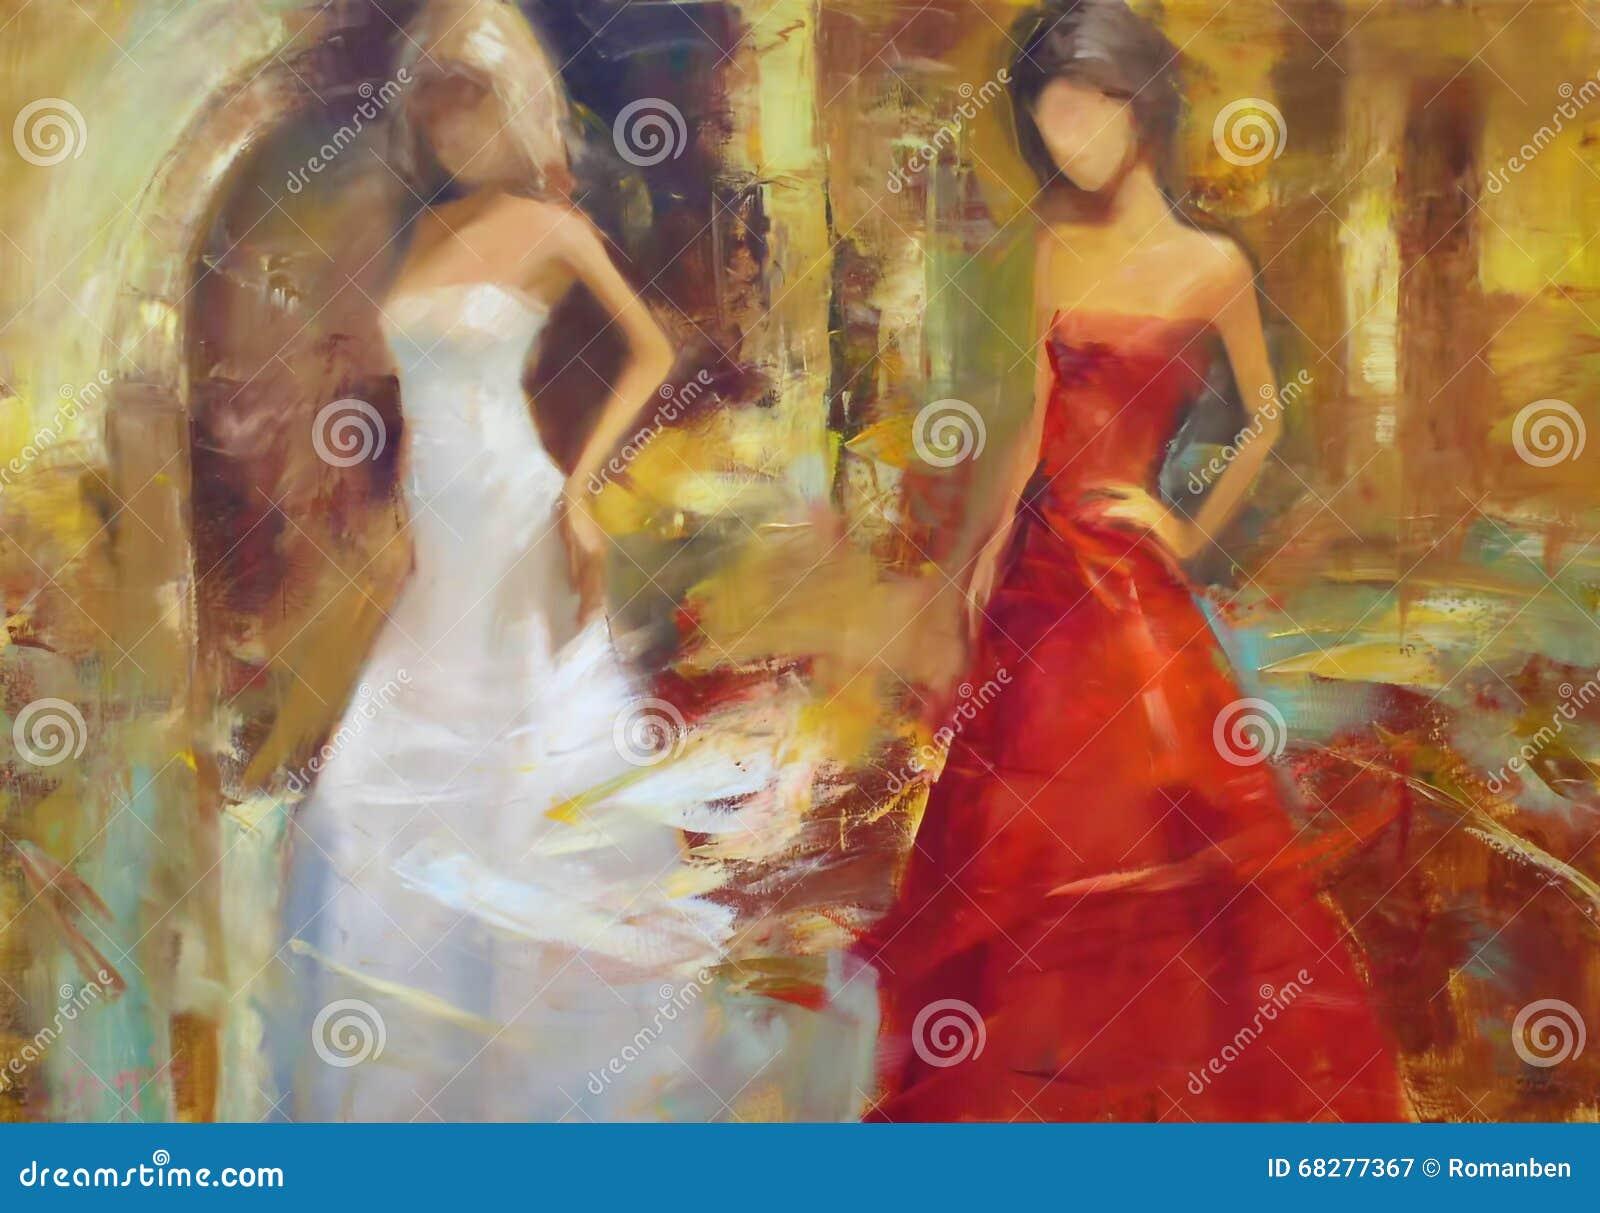 Female Figures Handmade Oil Painting On Canvas